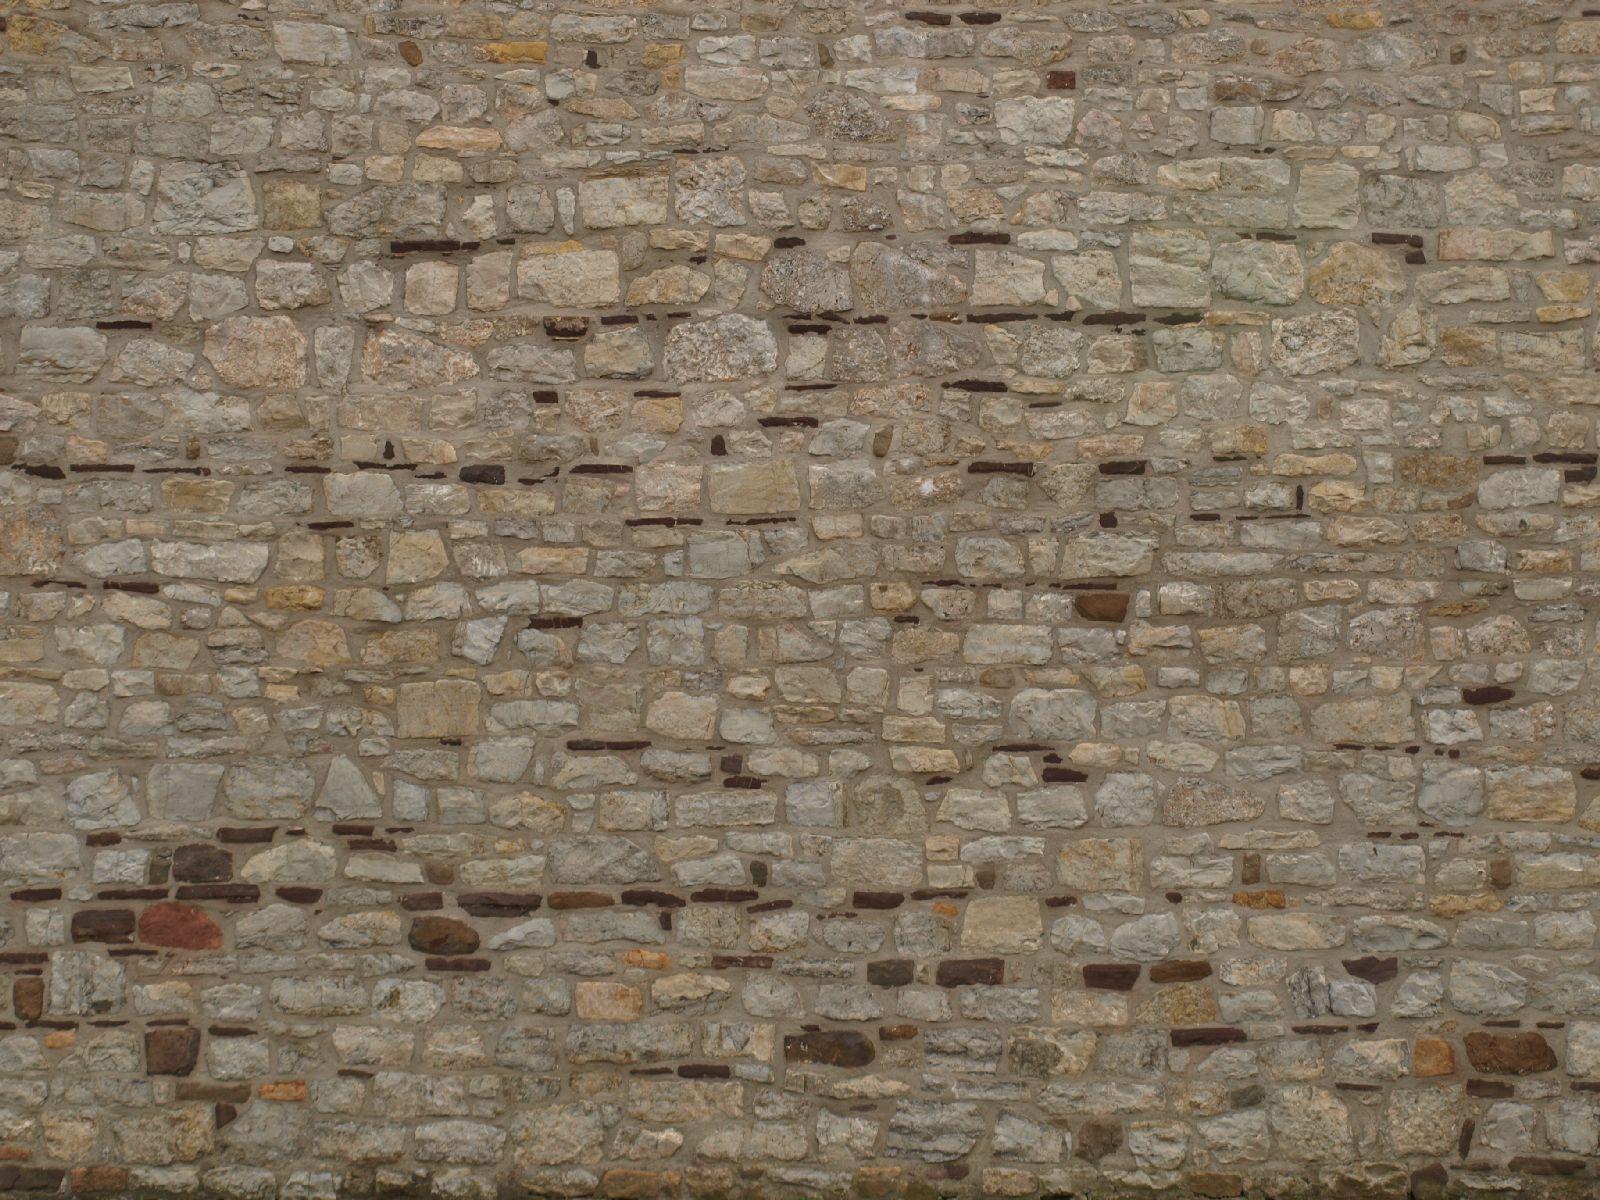 Wand-Bruchstein_Textur_A_PA260620